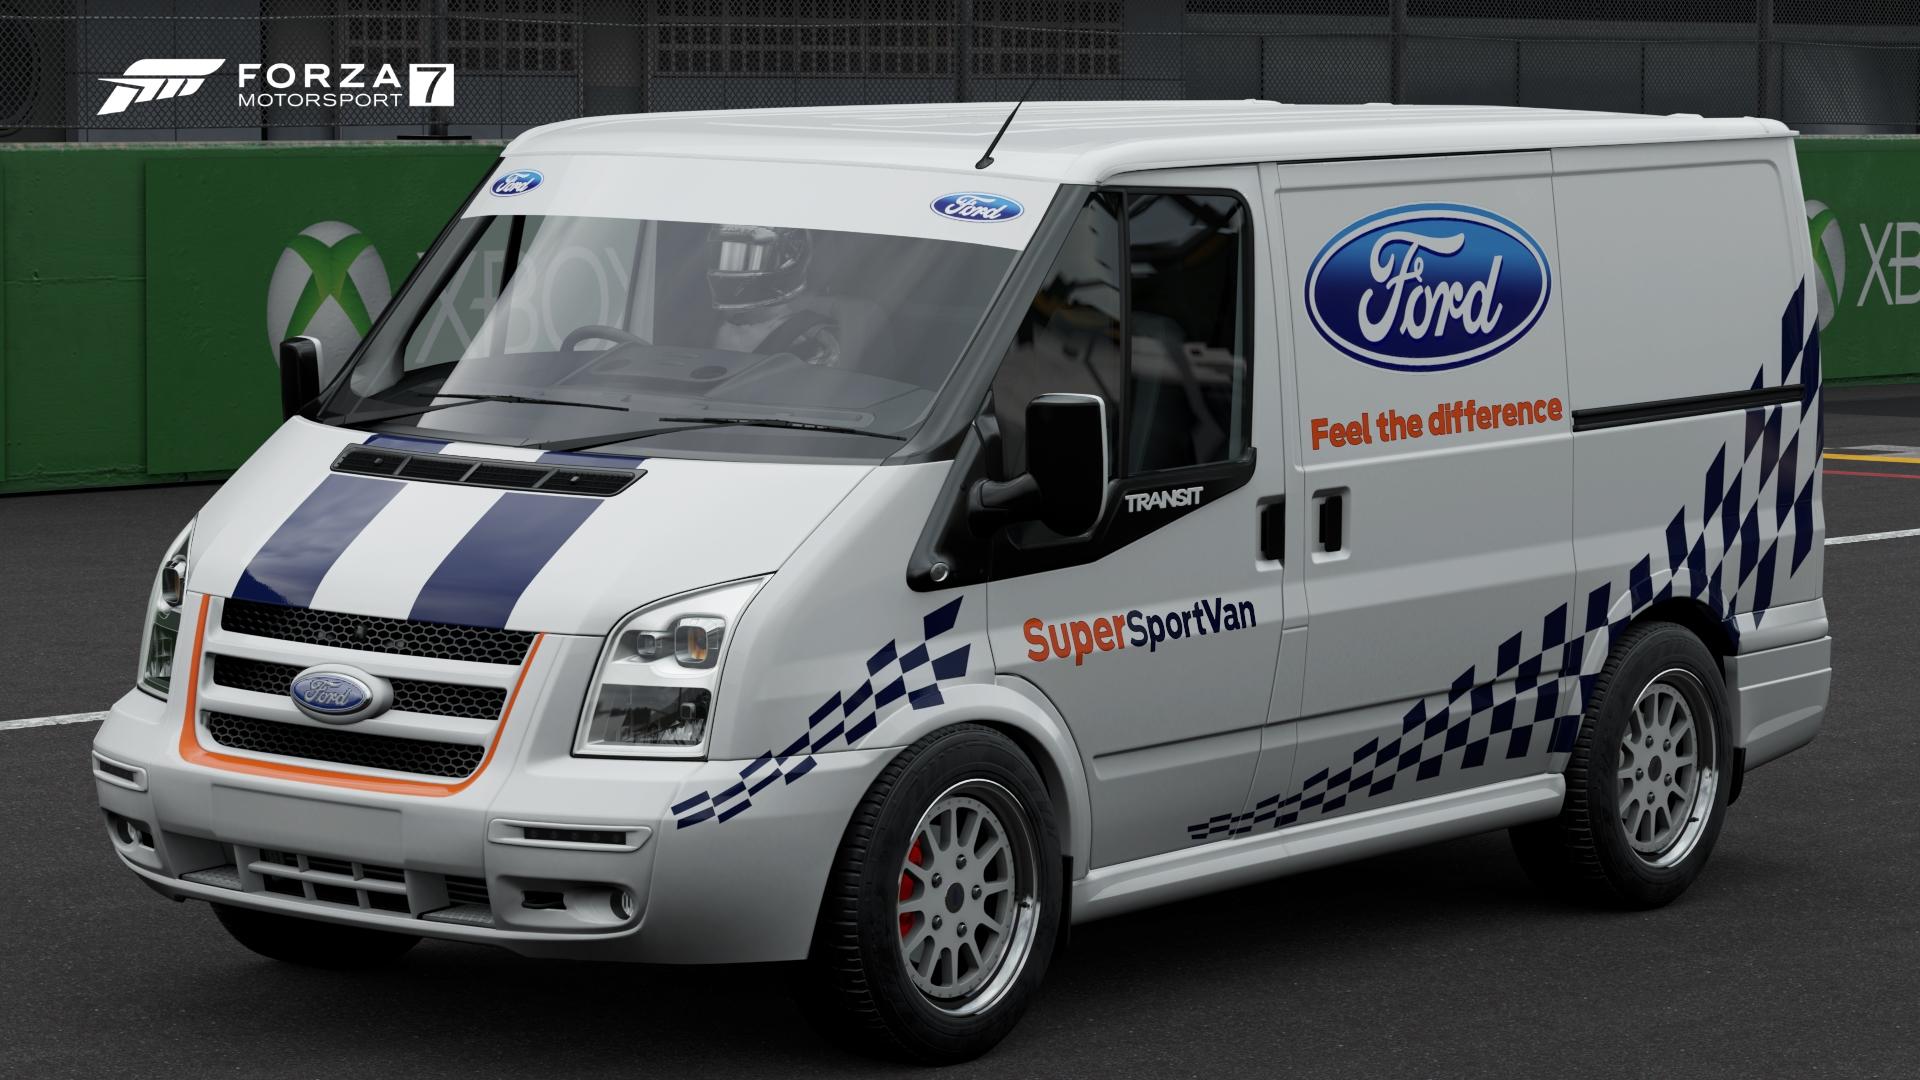 Ford Transit Sport Van >> Ford Transit SuperSportVan | Forza Motorsport Wiki | FANDOM powered by Wikia